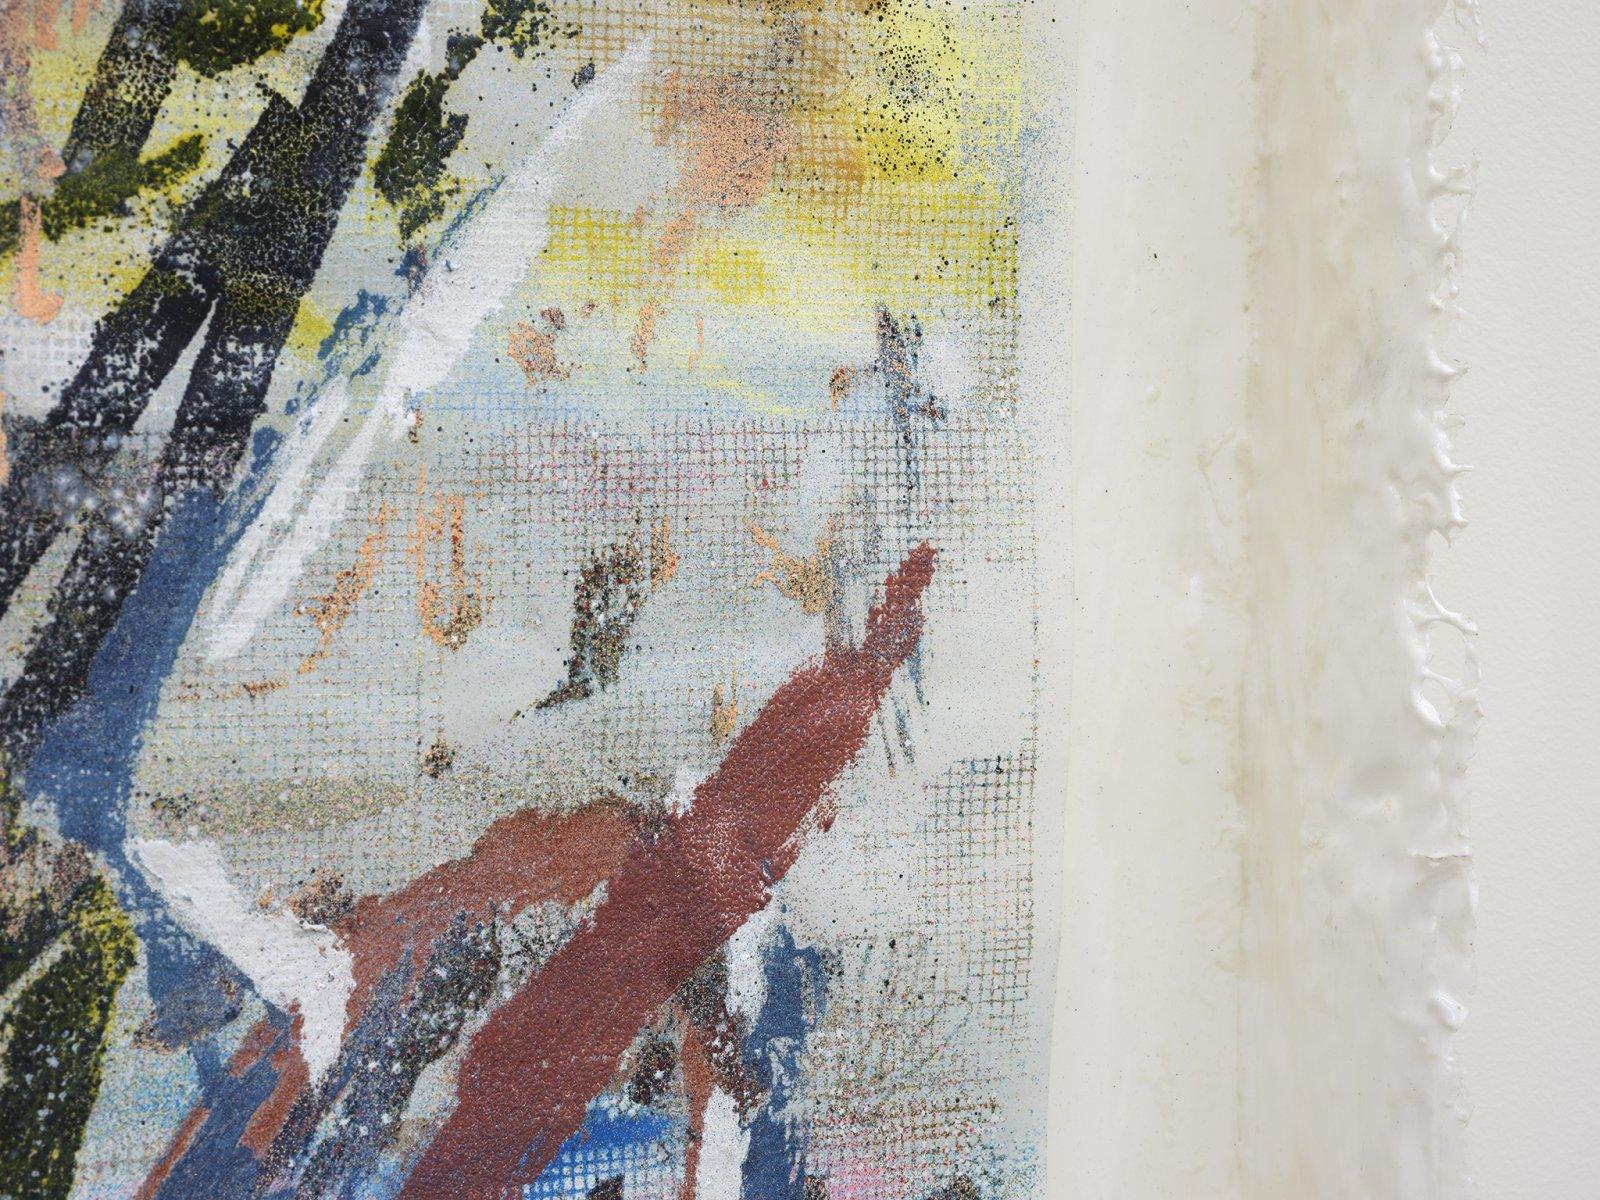 Rebecca Brewer, Live Resin: Flood Notes (detail), 2019, urethane resin, aluminum mesh, pigment, plexiglas, embossing powder on vellum, 41 x 29 in. (104 x 74 cm)